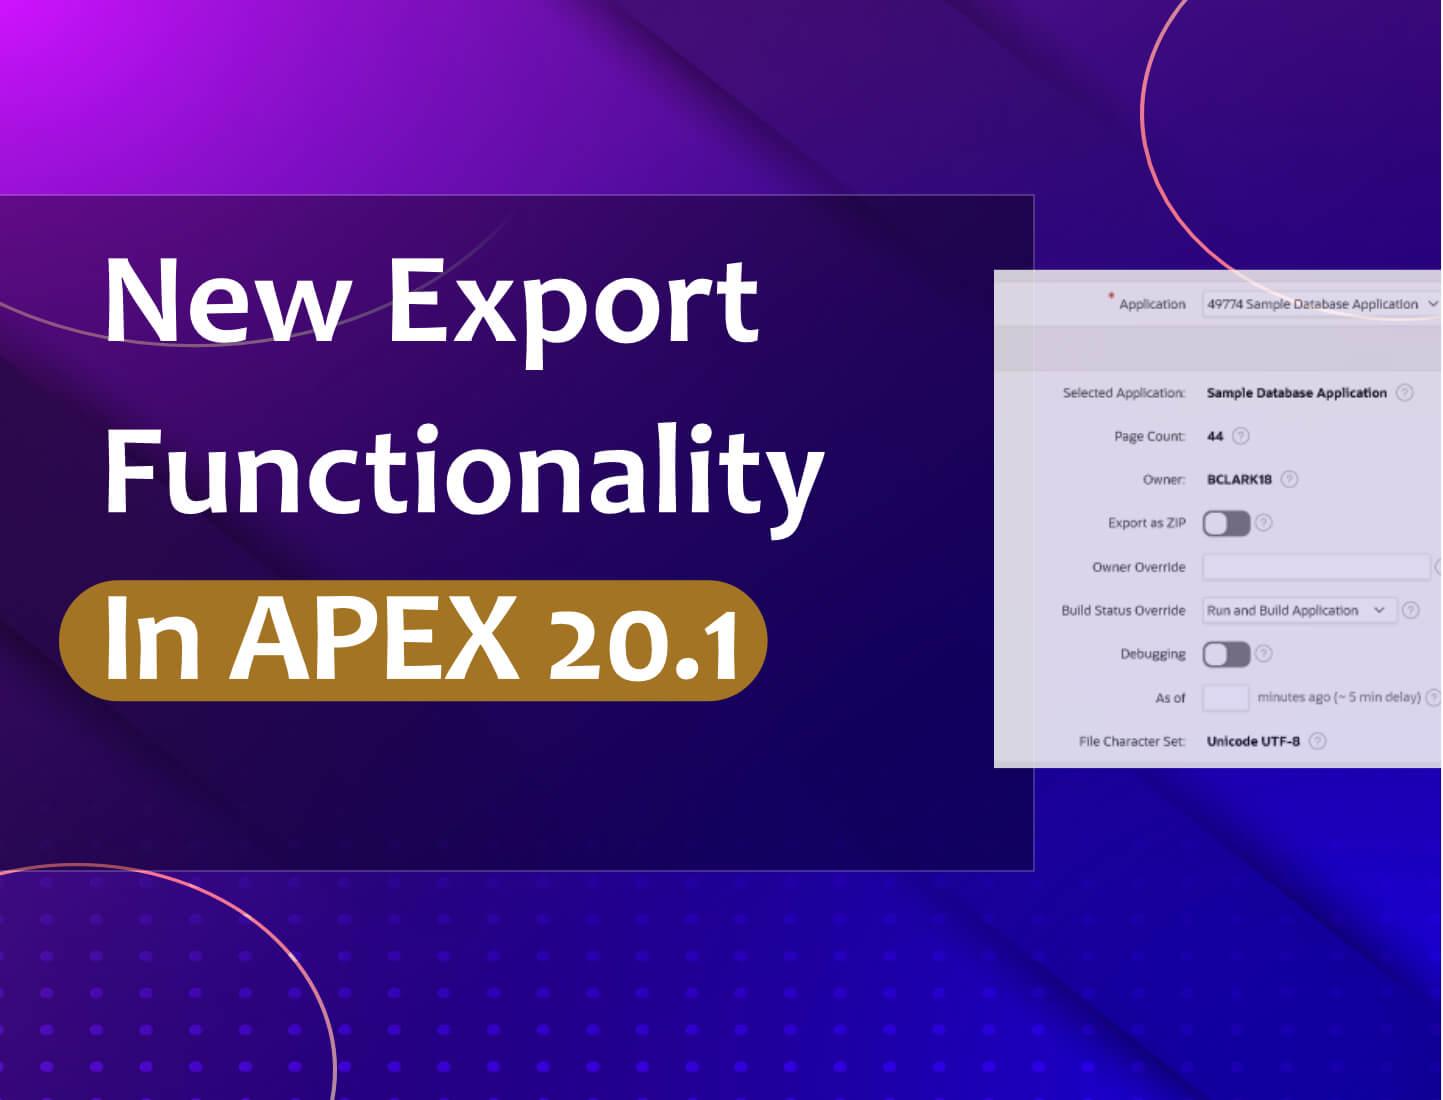 new export functionalitiy in apex 20.1